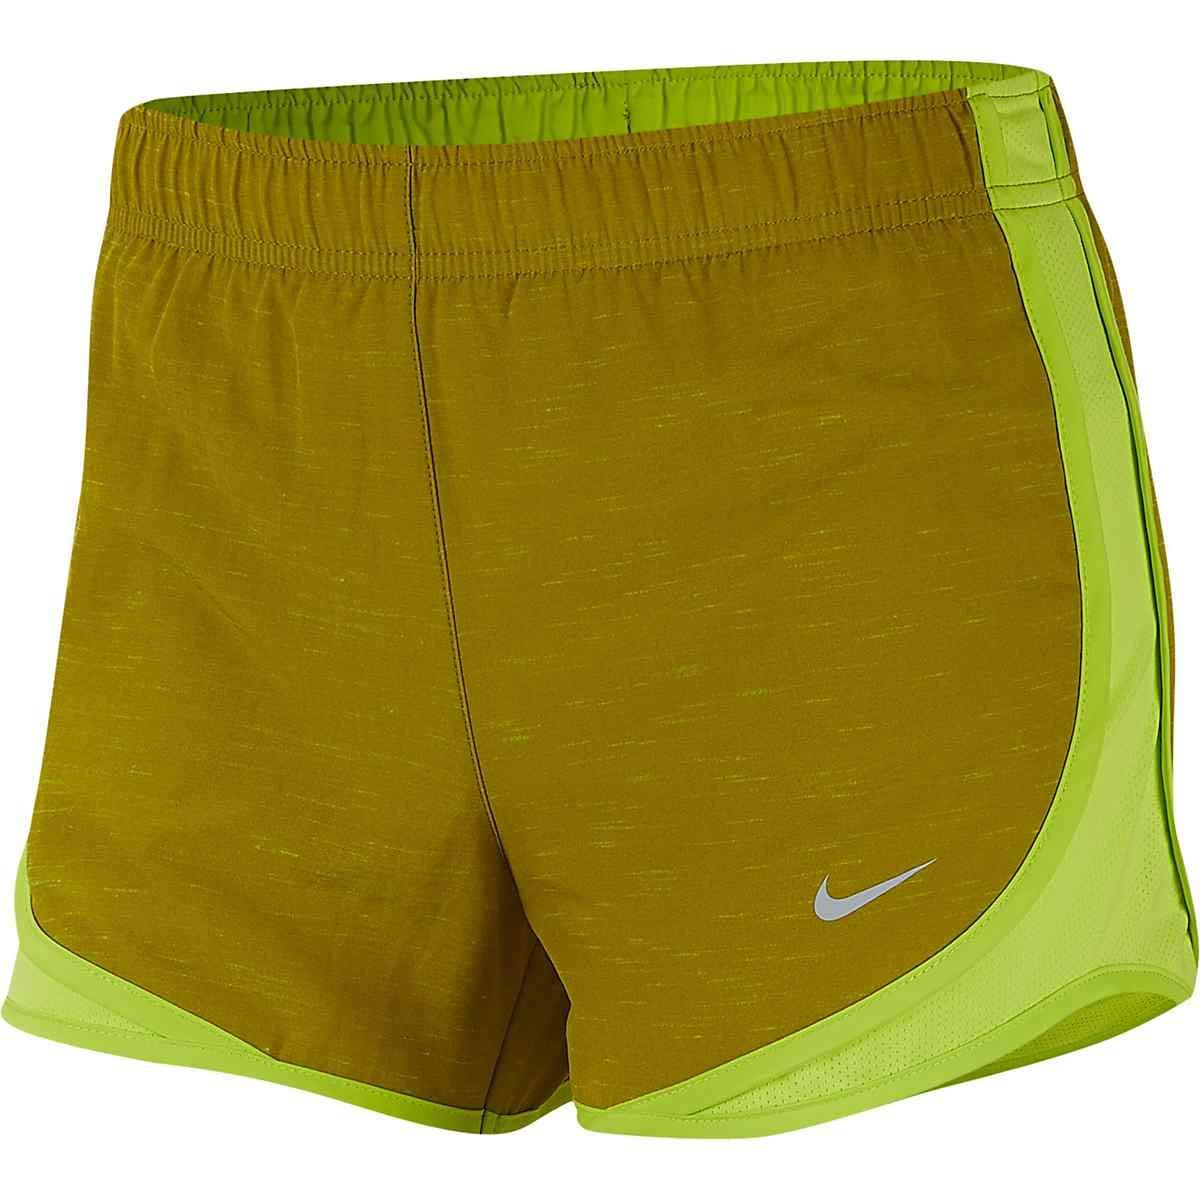 Nike Women's Dri-fit Tempo Track 3.5 Short (Green Bright, Medium) by Nike